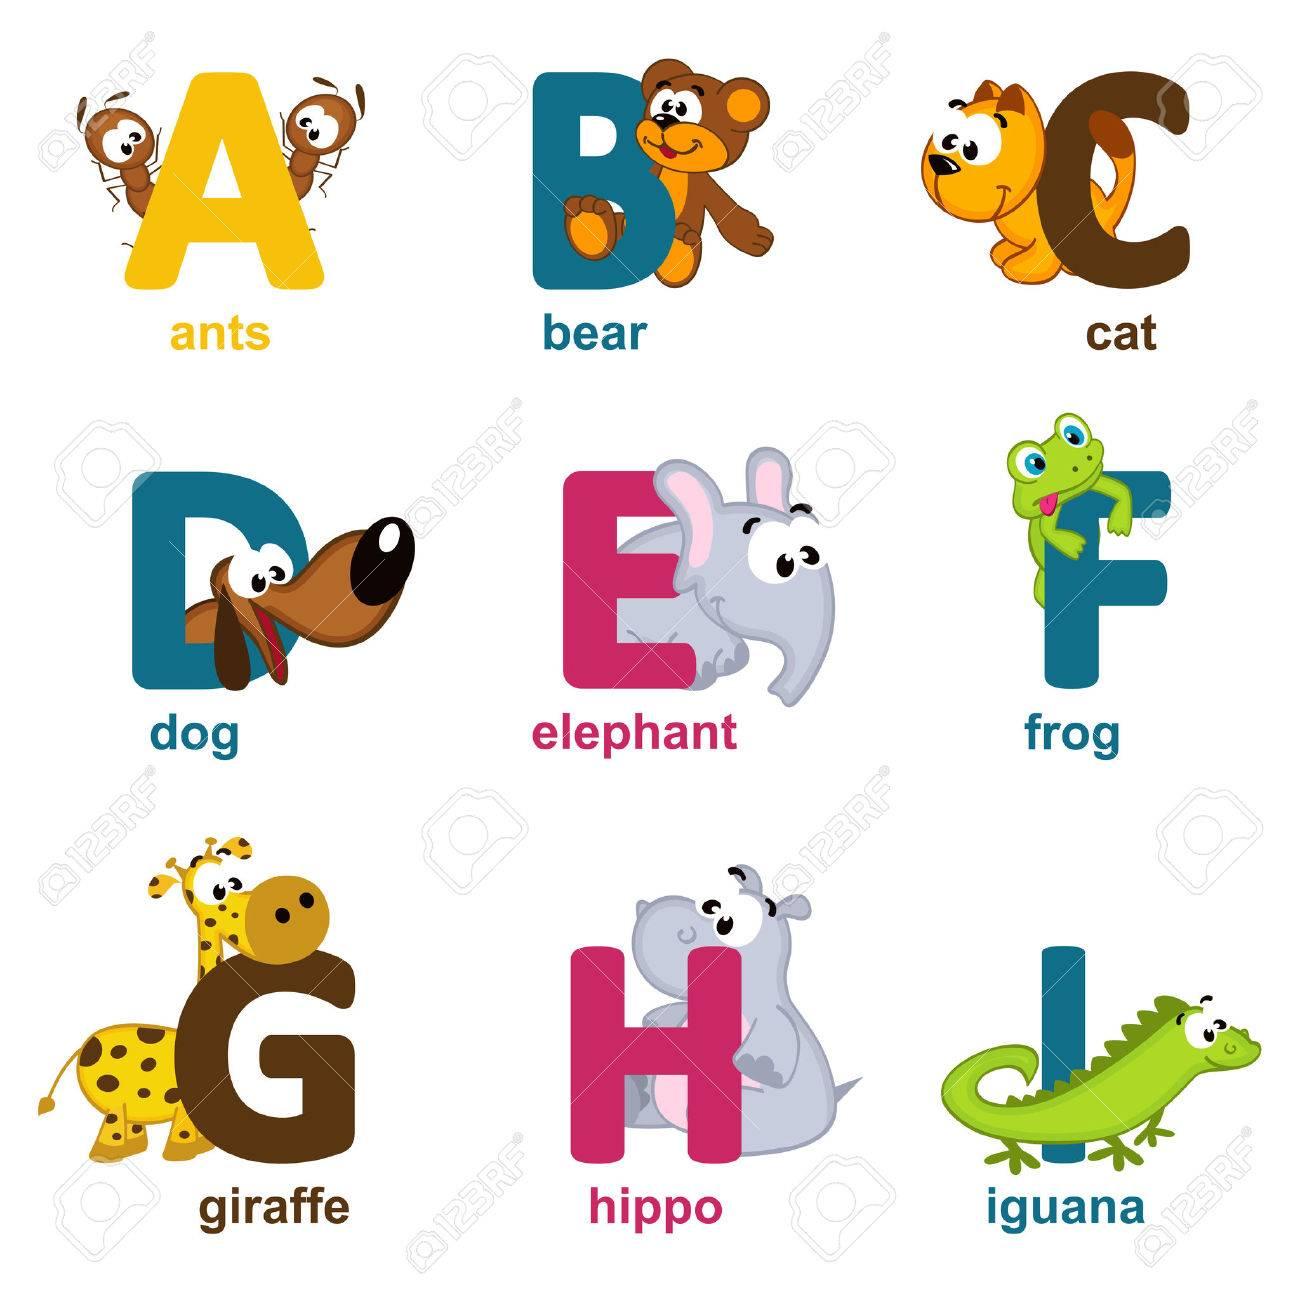 alphabet animals from A to I - vector illustration Standard-Bild - 24596302